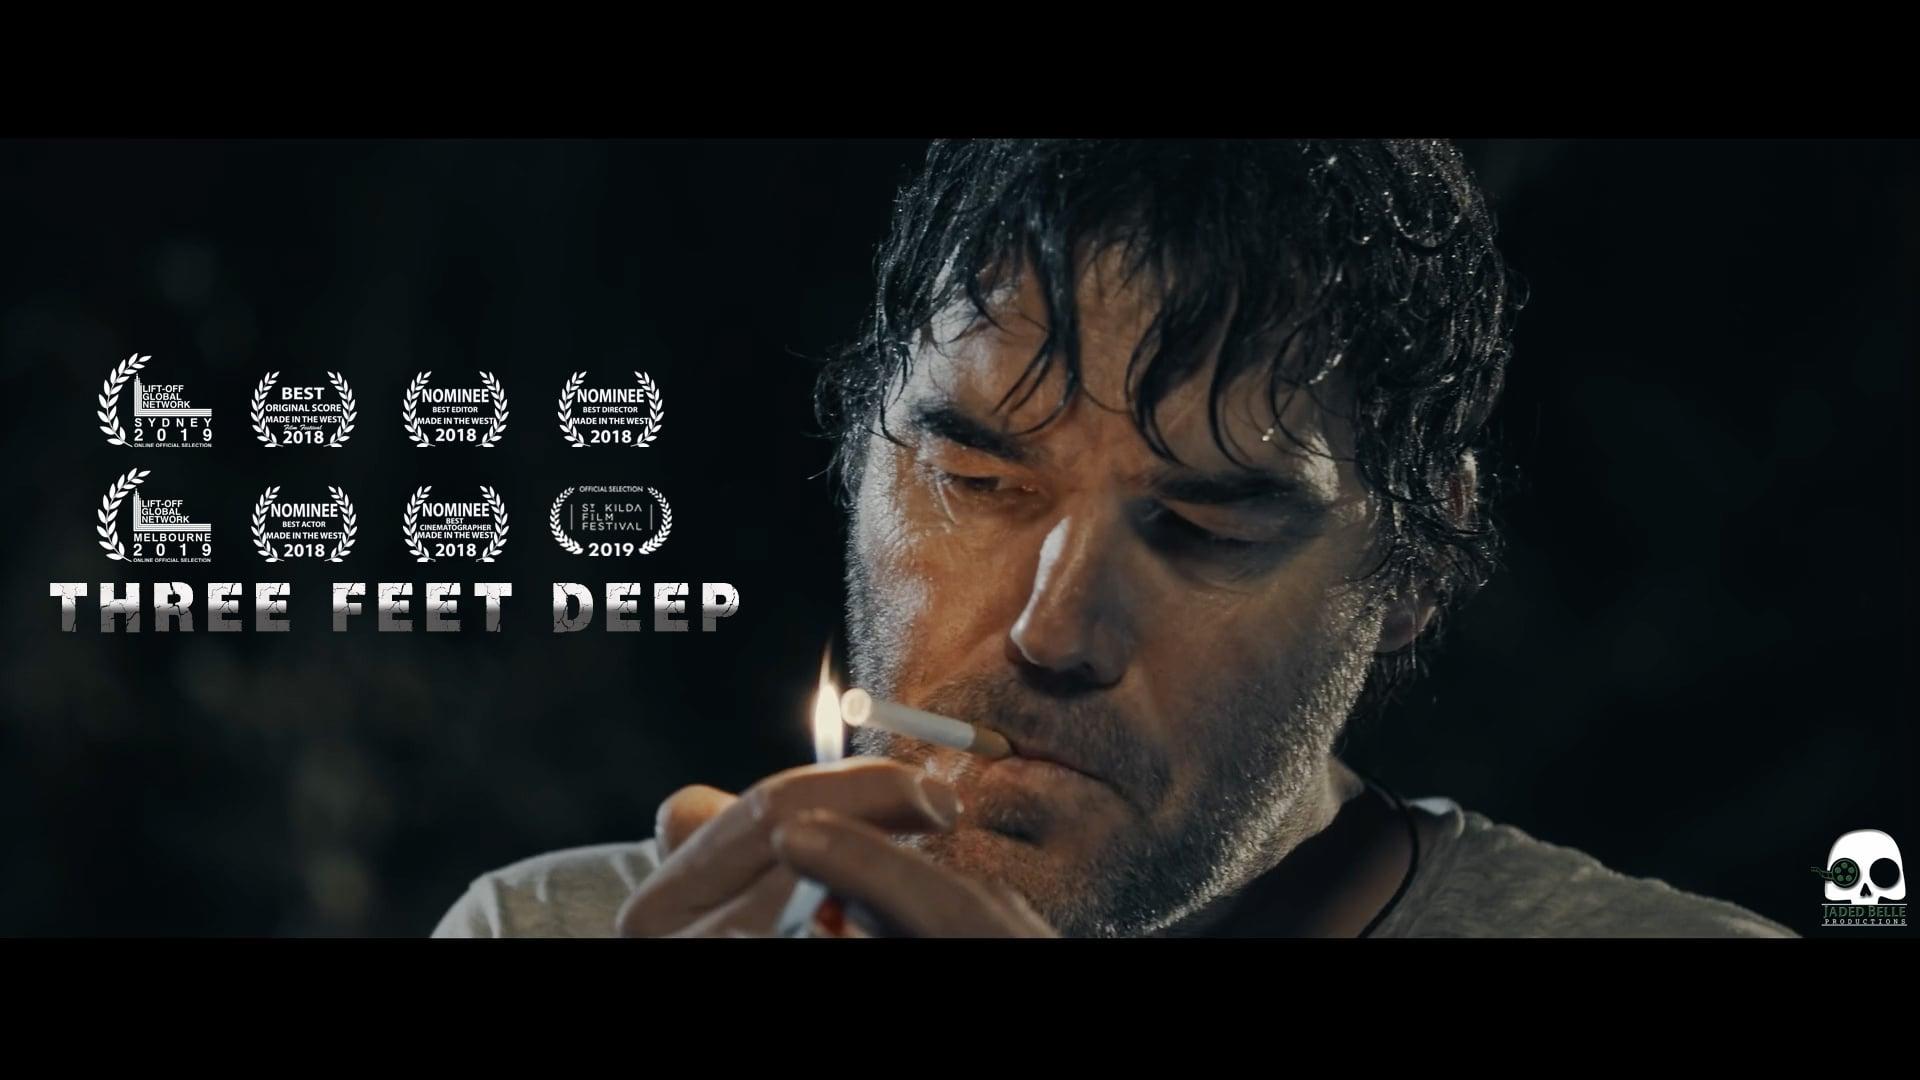 Three Feet Deep (short film) Trailer